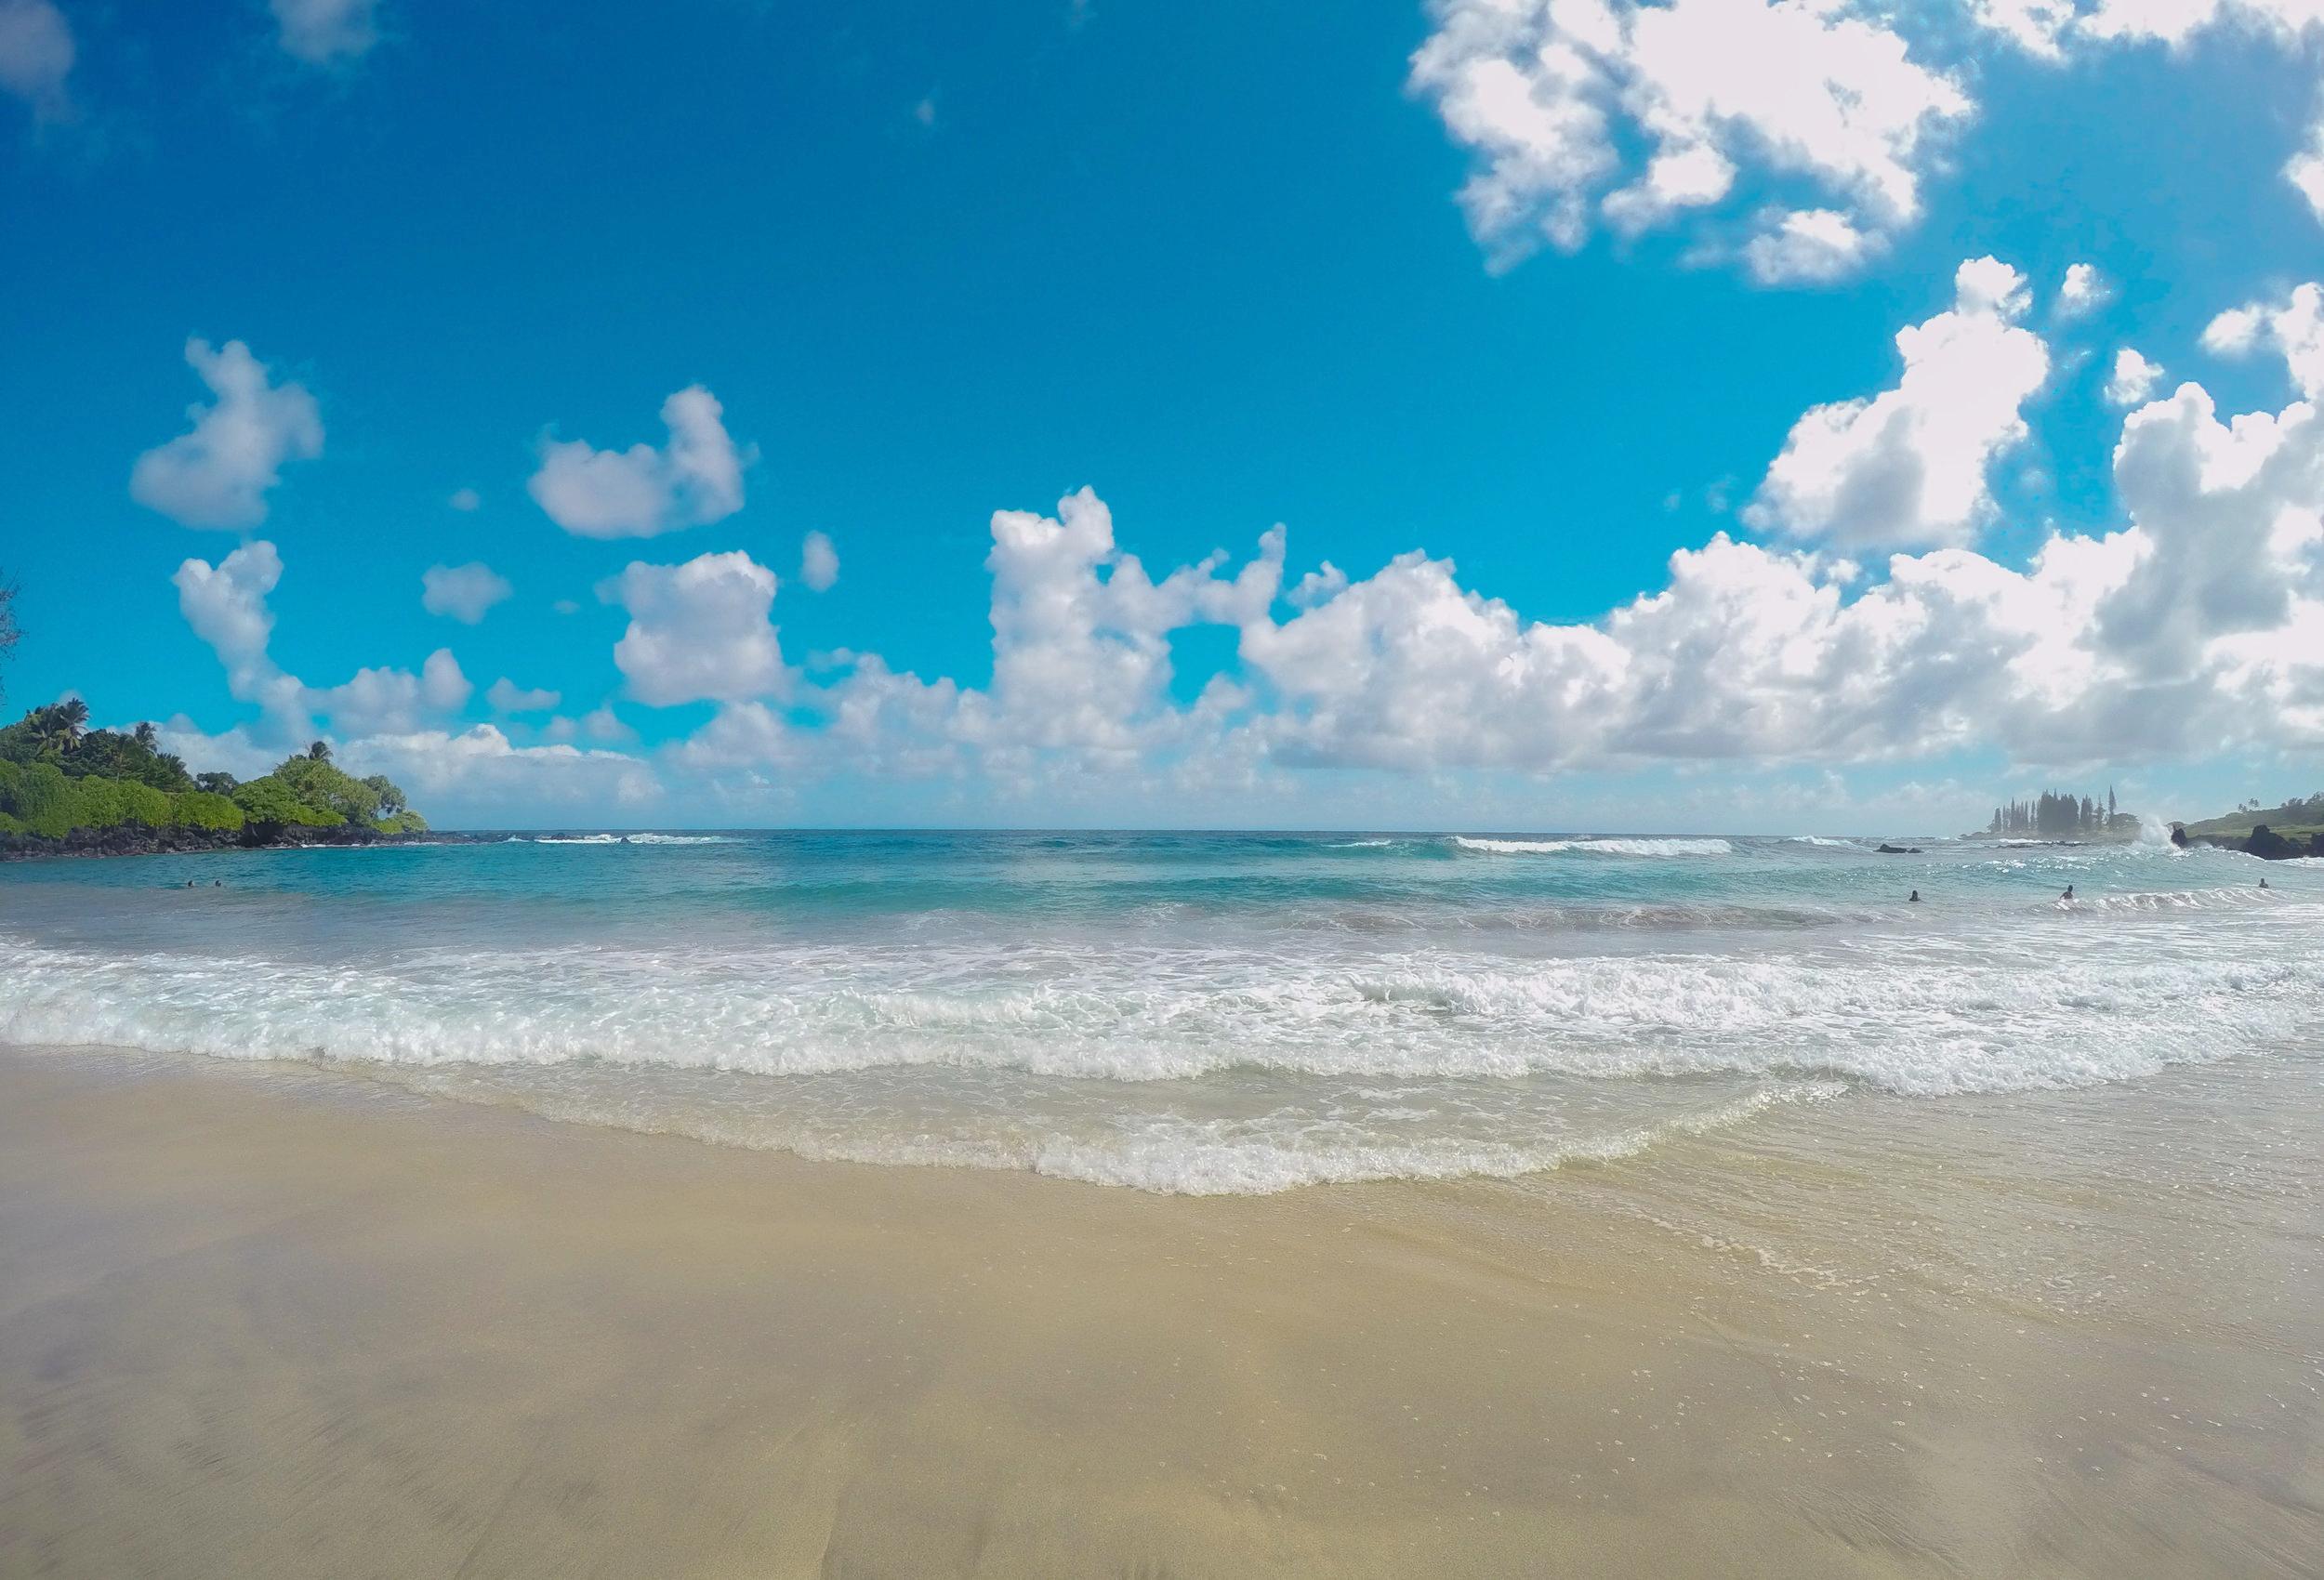 Road to Hana Stops - Beach - Things to do in Maui, Hawaii